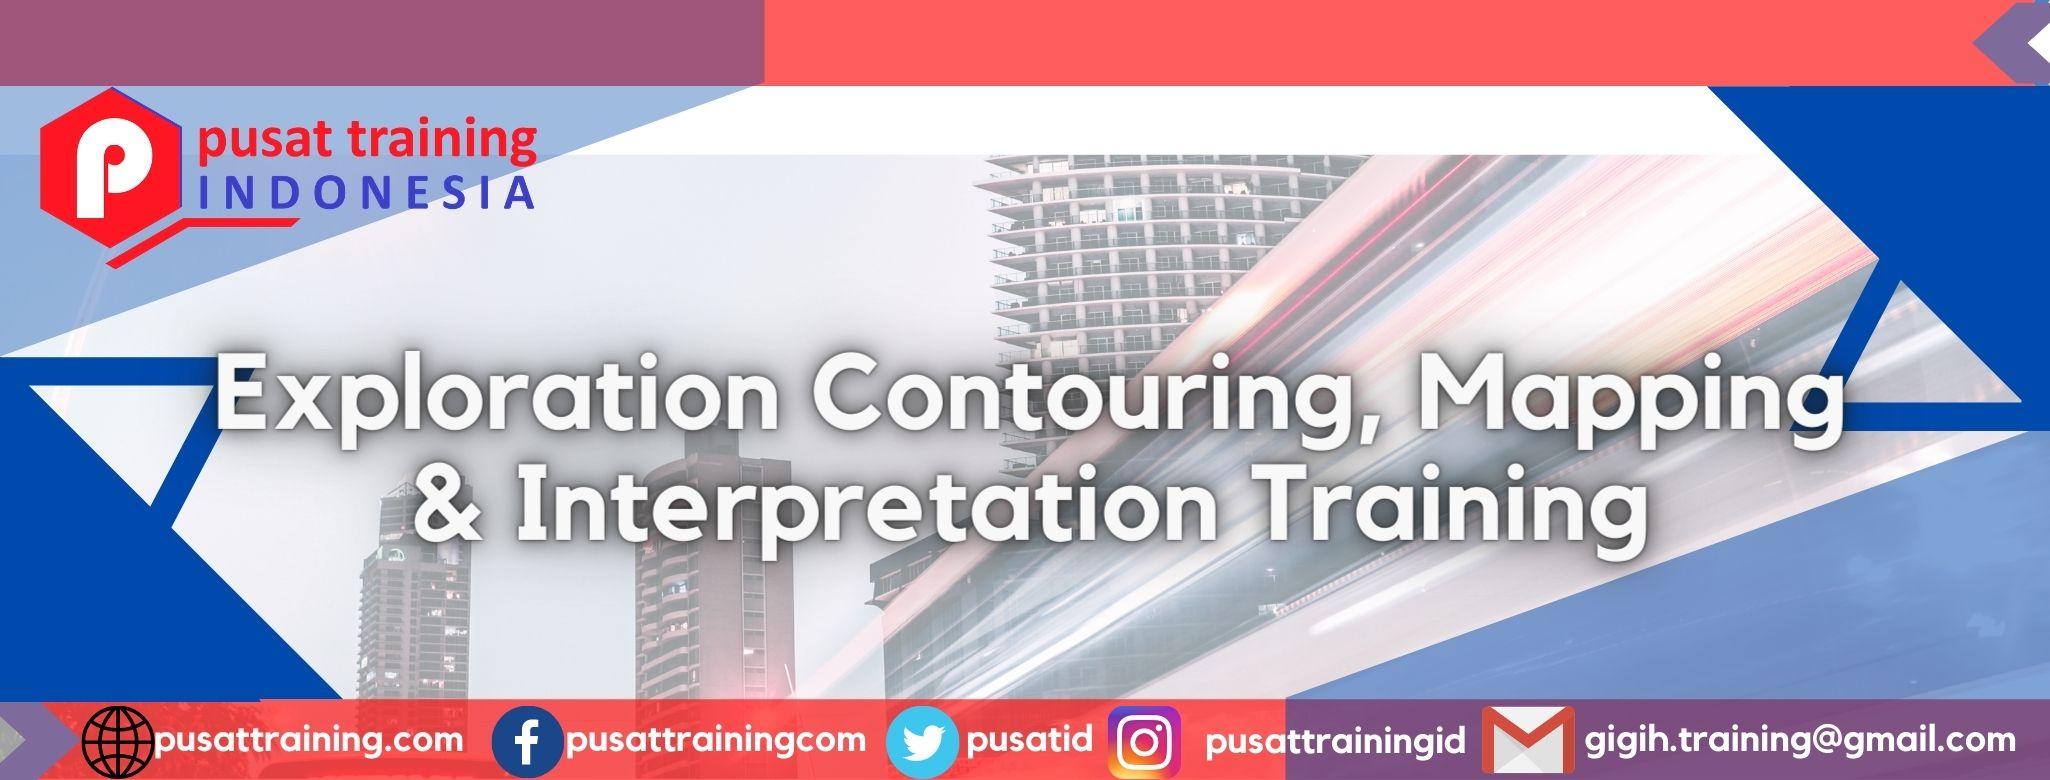 exploration-contouring-mapping-interpretation-training